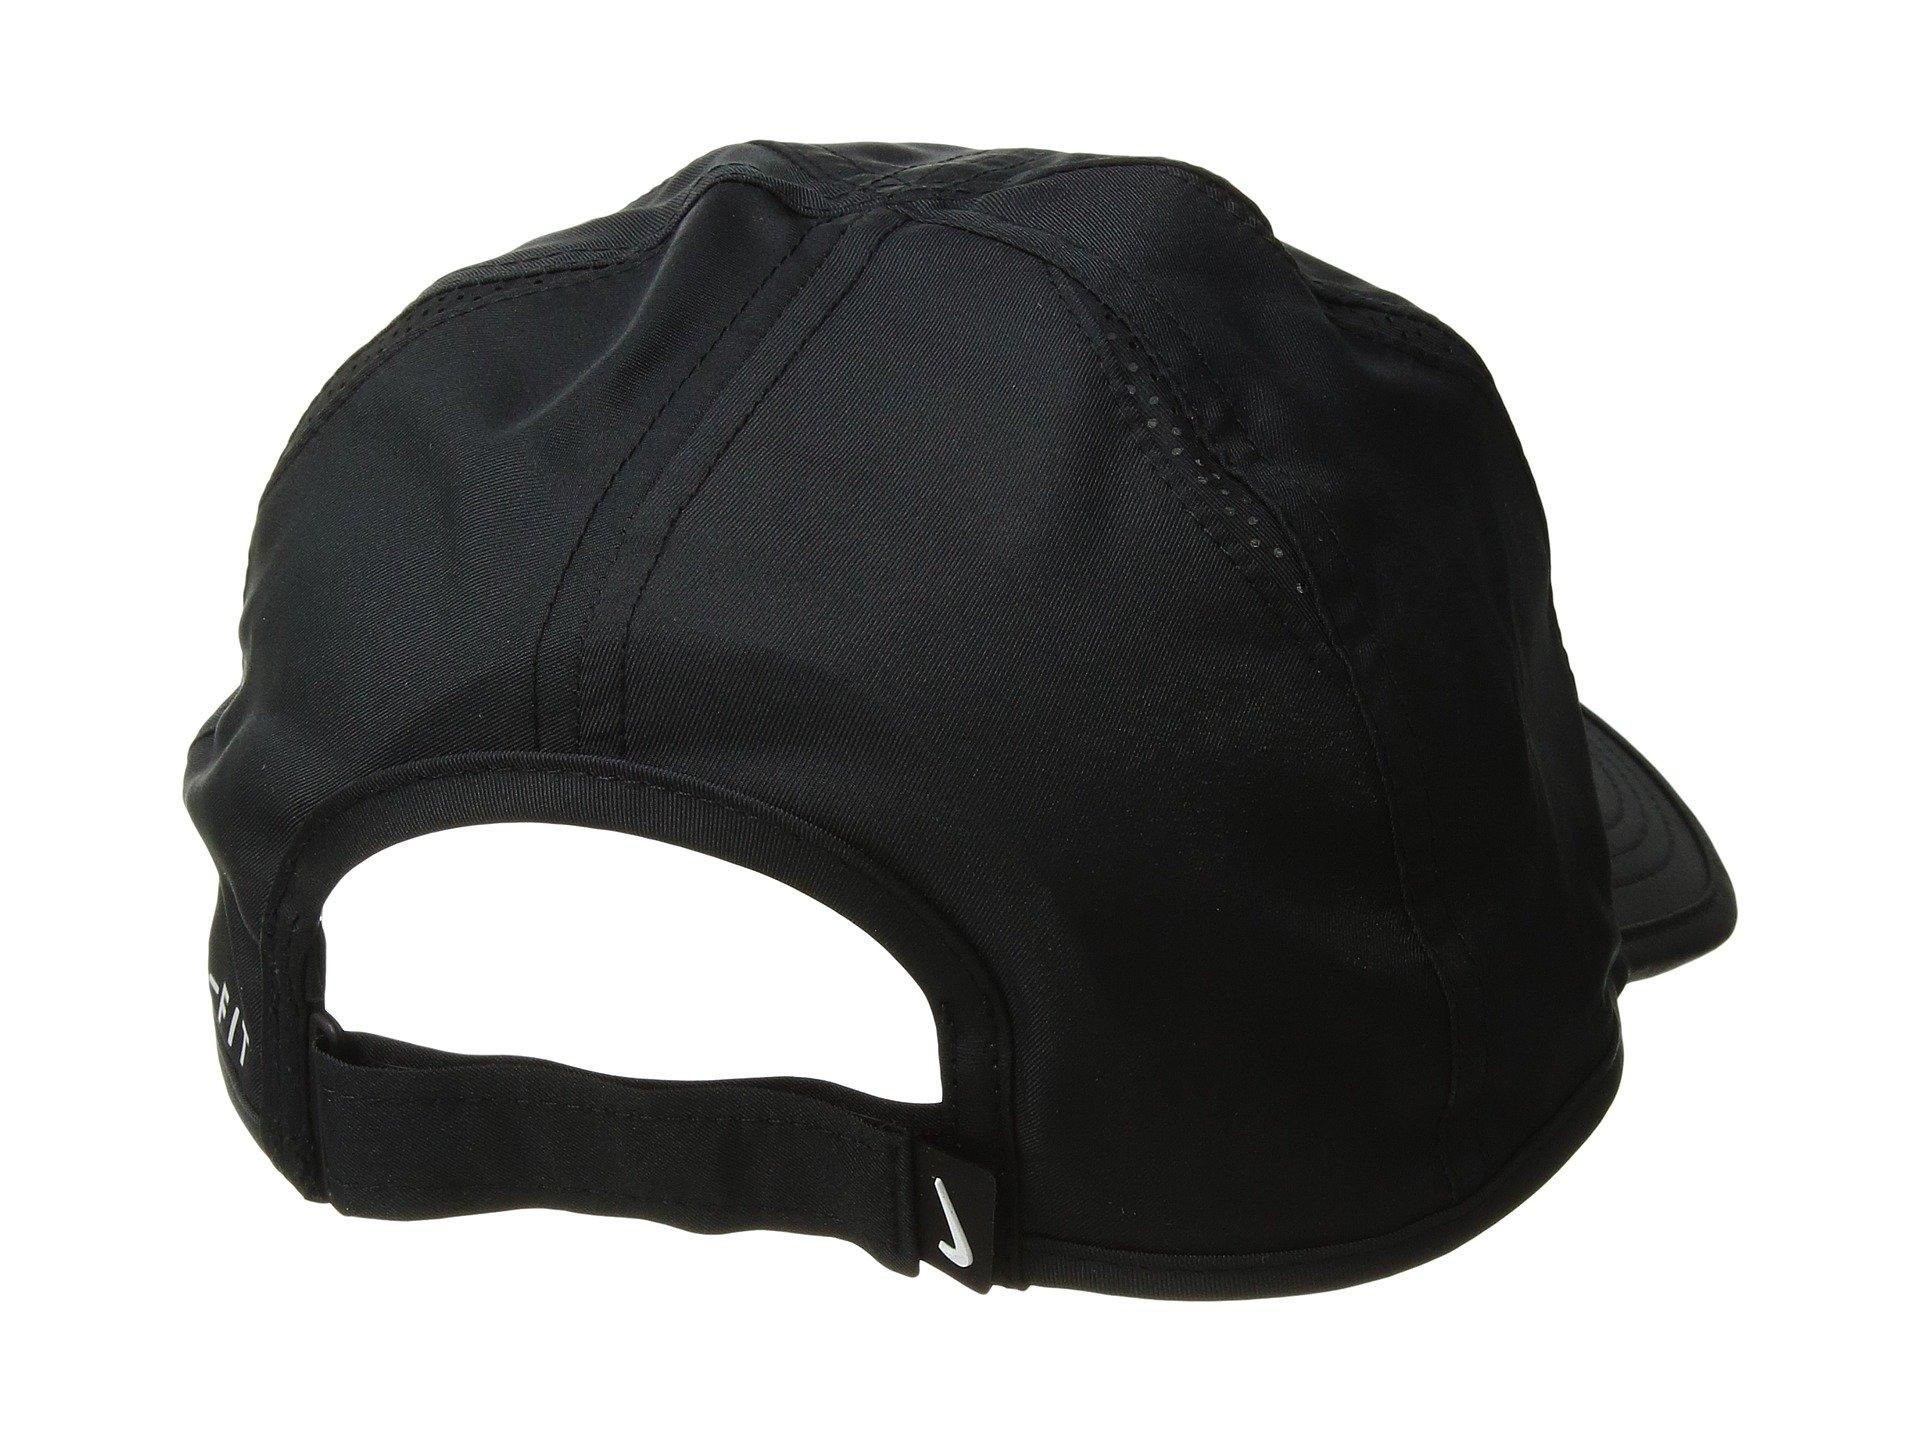 7634ea58 Nike Featherlight Cap (team Crimson/black/white) Caps in Black for ...